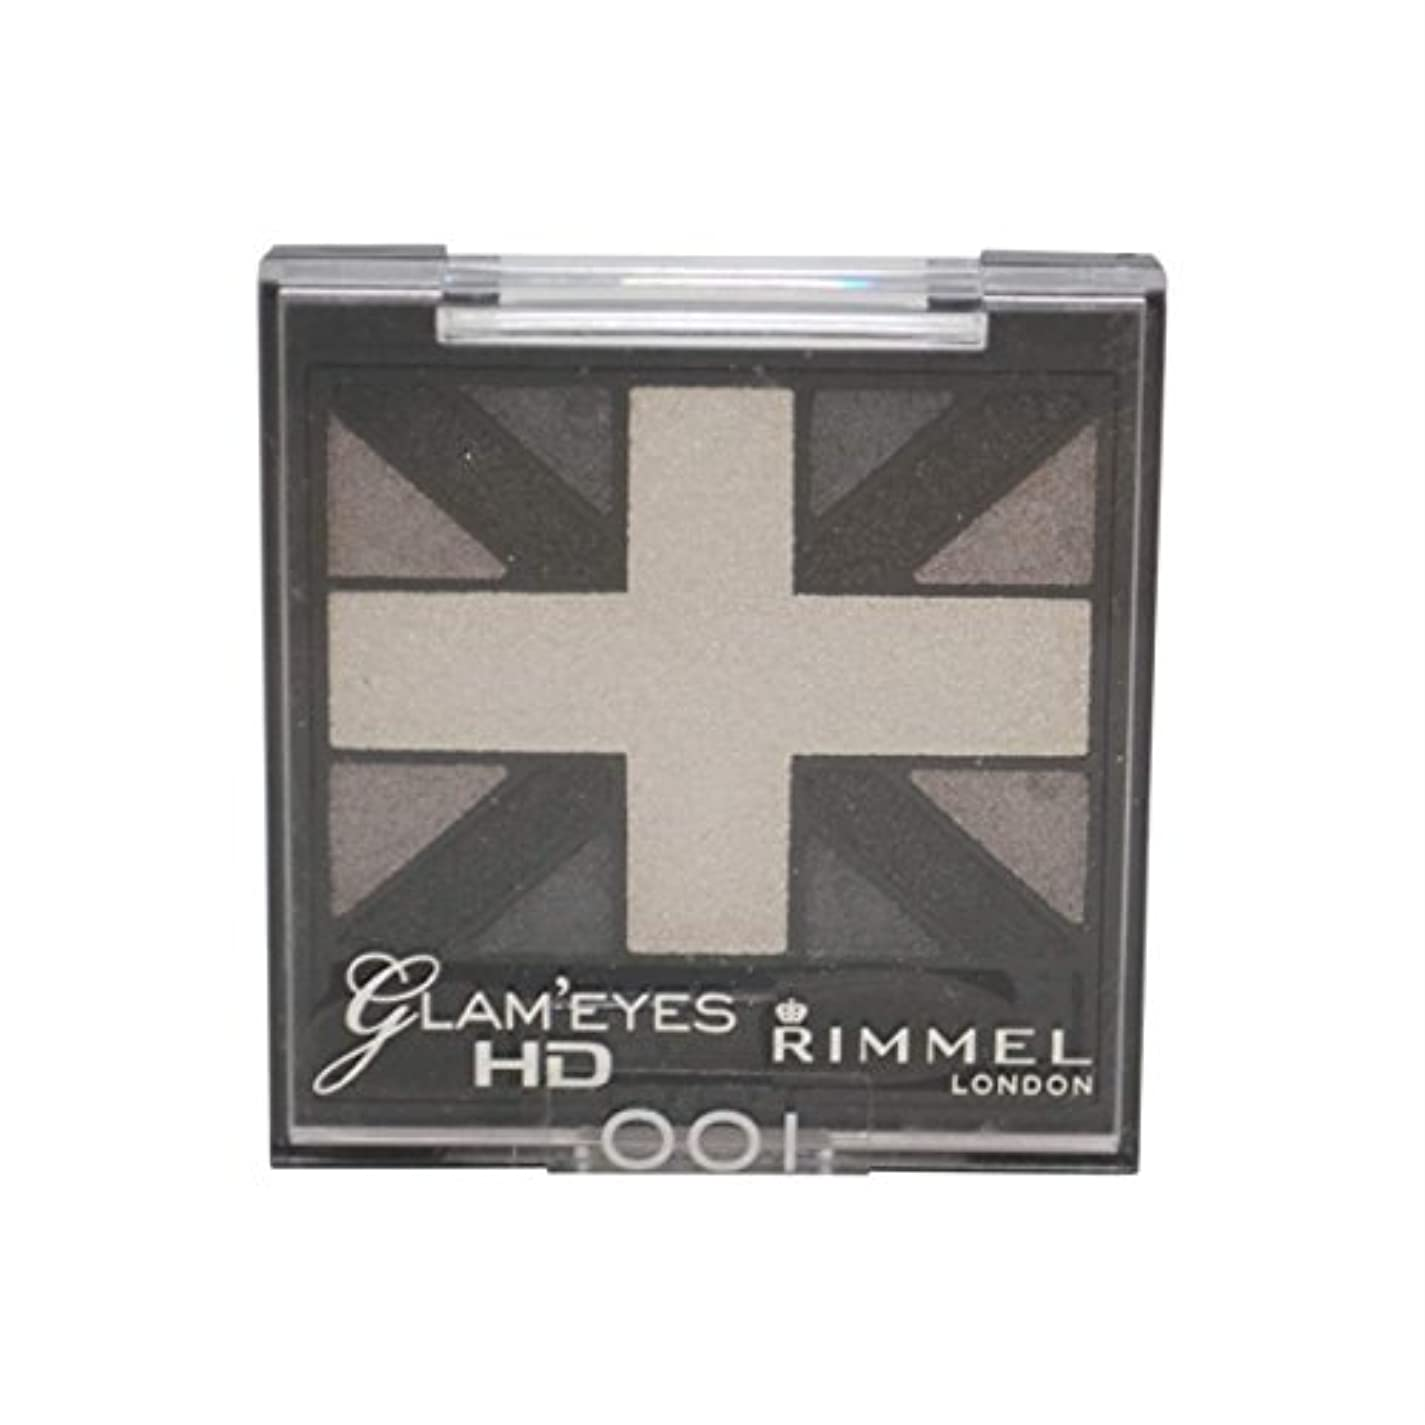 RIMMEL LONDON Glam'Eyes HD Eyeshadows Black Cab (並行輸入品)